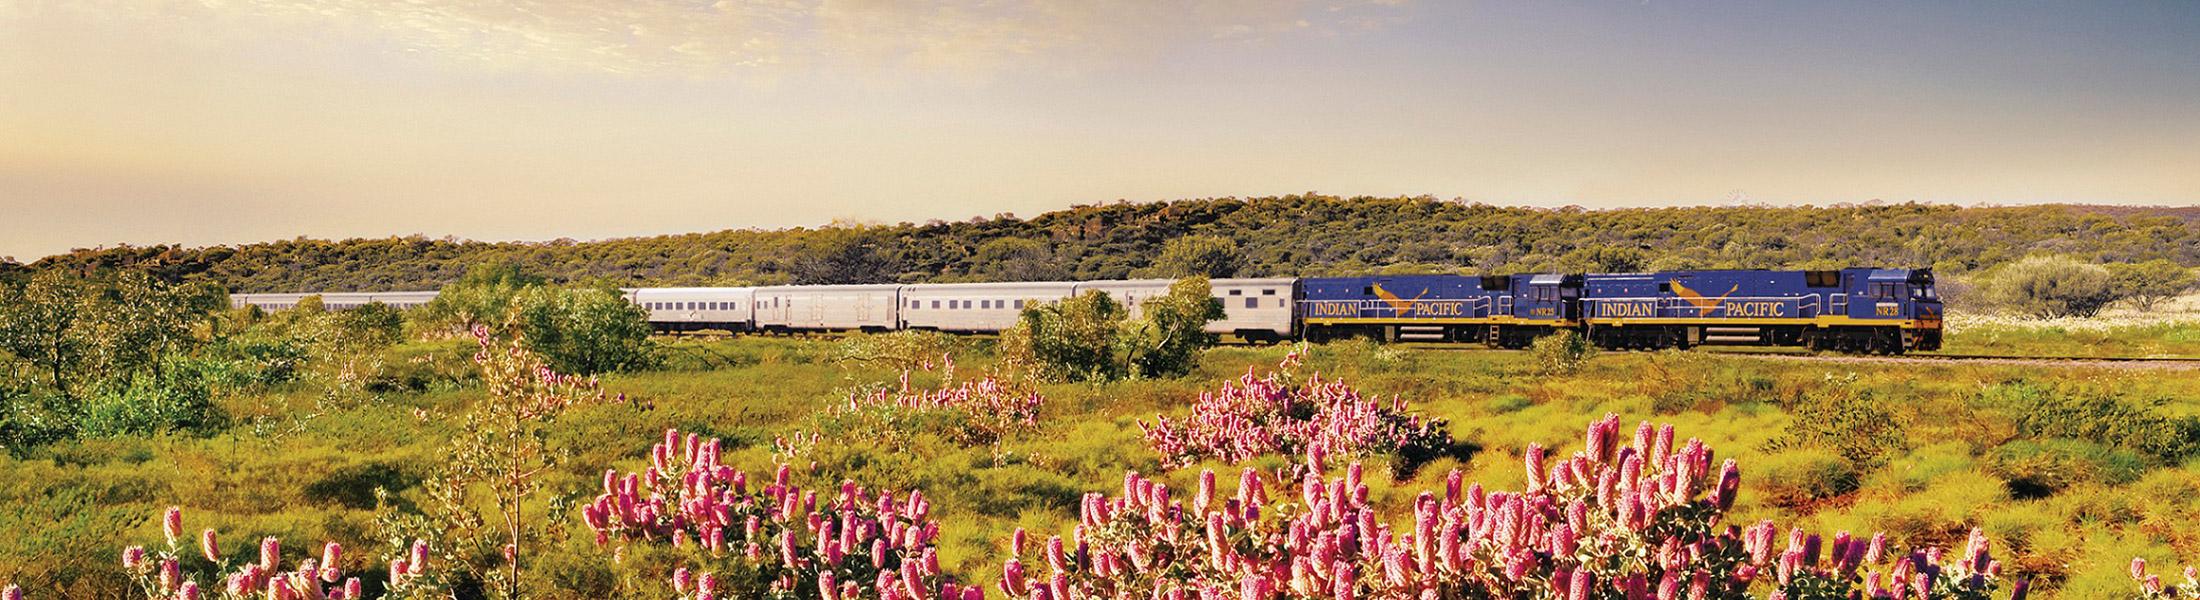 Indian Pacific train in Australia